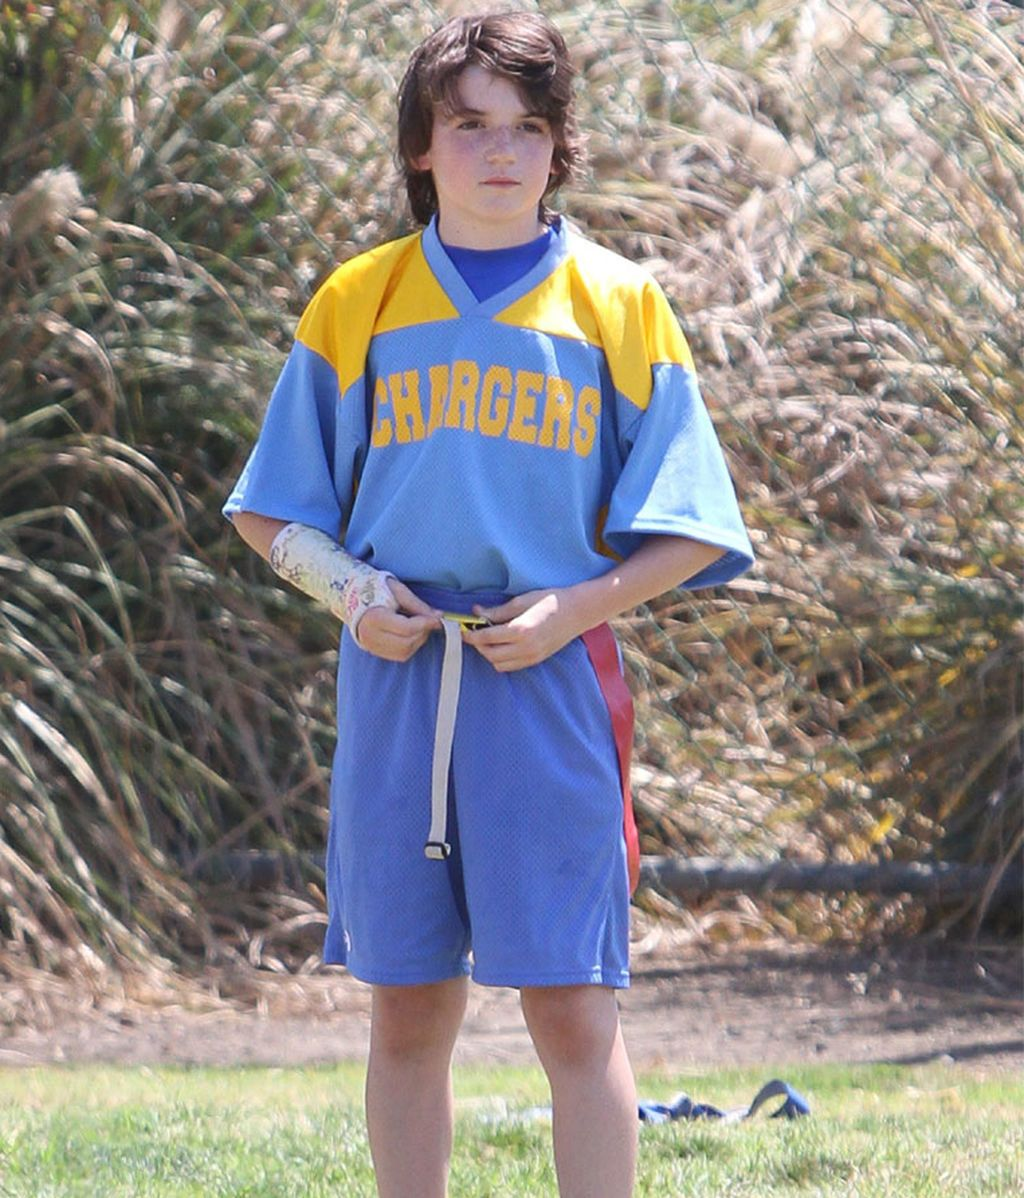 Liam, hijo de Harrison Ford y Calista Flockhart